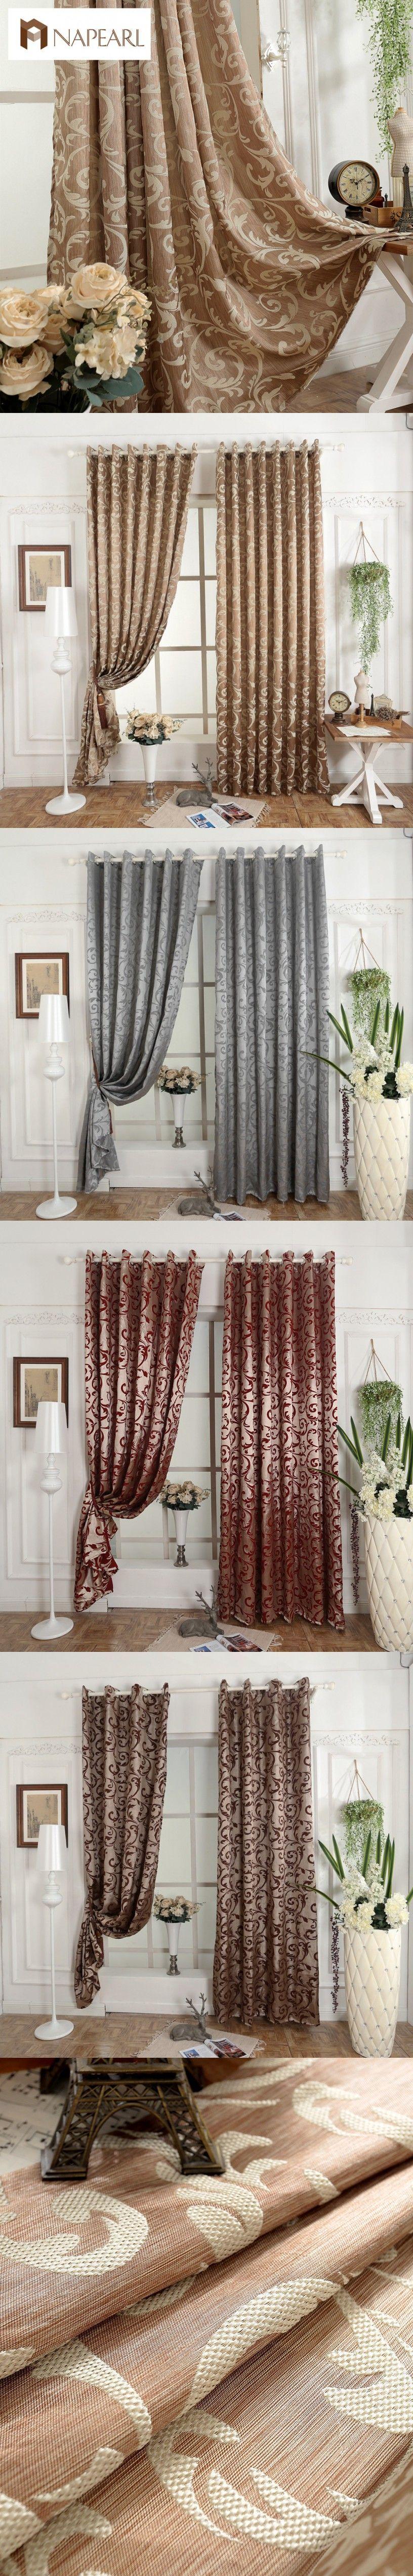 Best d scenery blackout curtains online door curtains kitchen